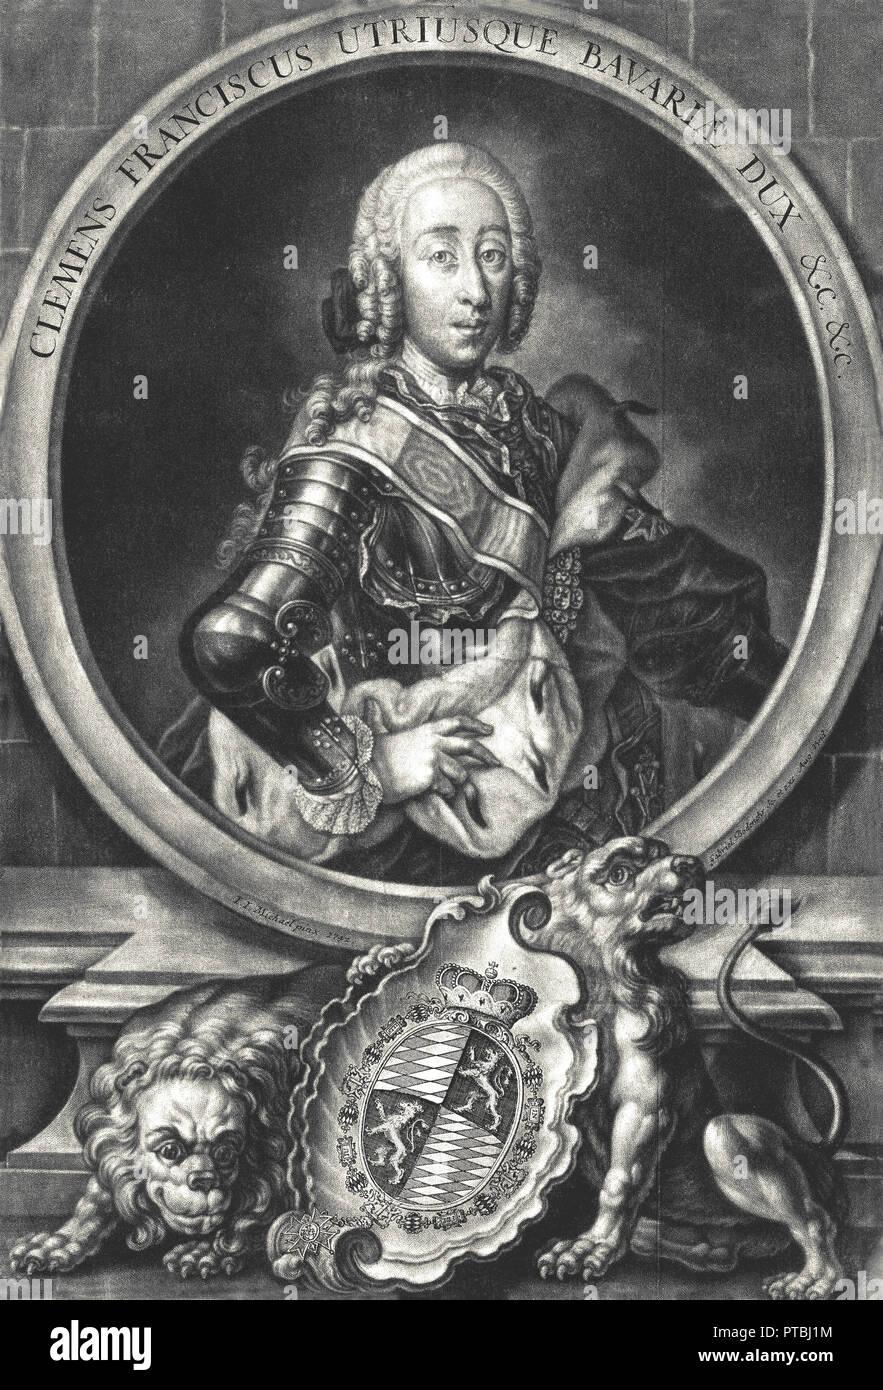 Portrait of Duke Clemens Franz de Paula of Bavaria, with armor (1722-1770). Grandson of king Maximilian II, elector of Bavaria. - Stock Image